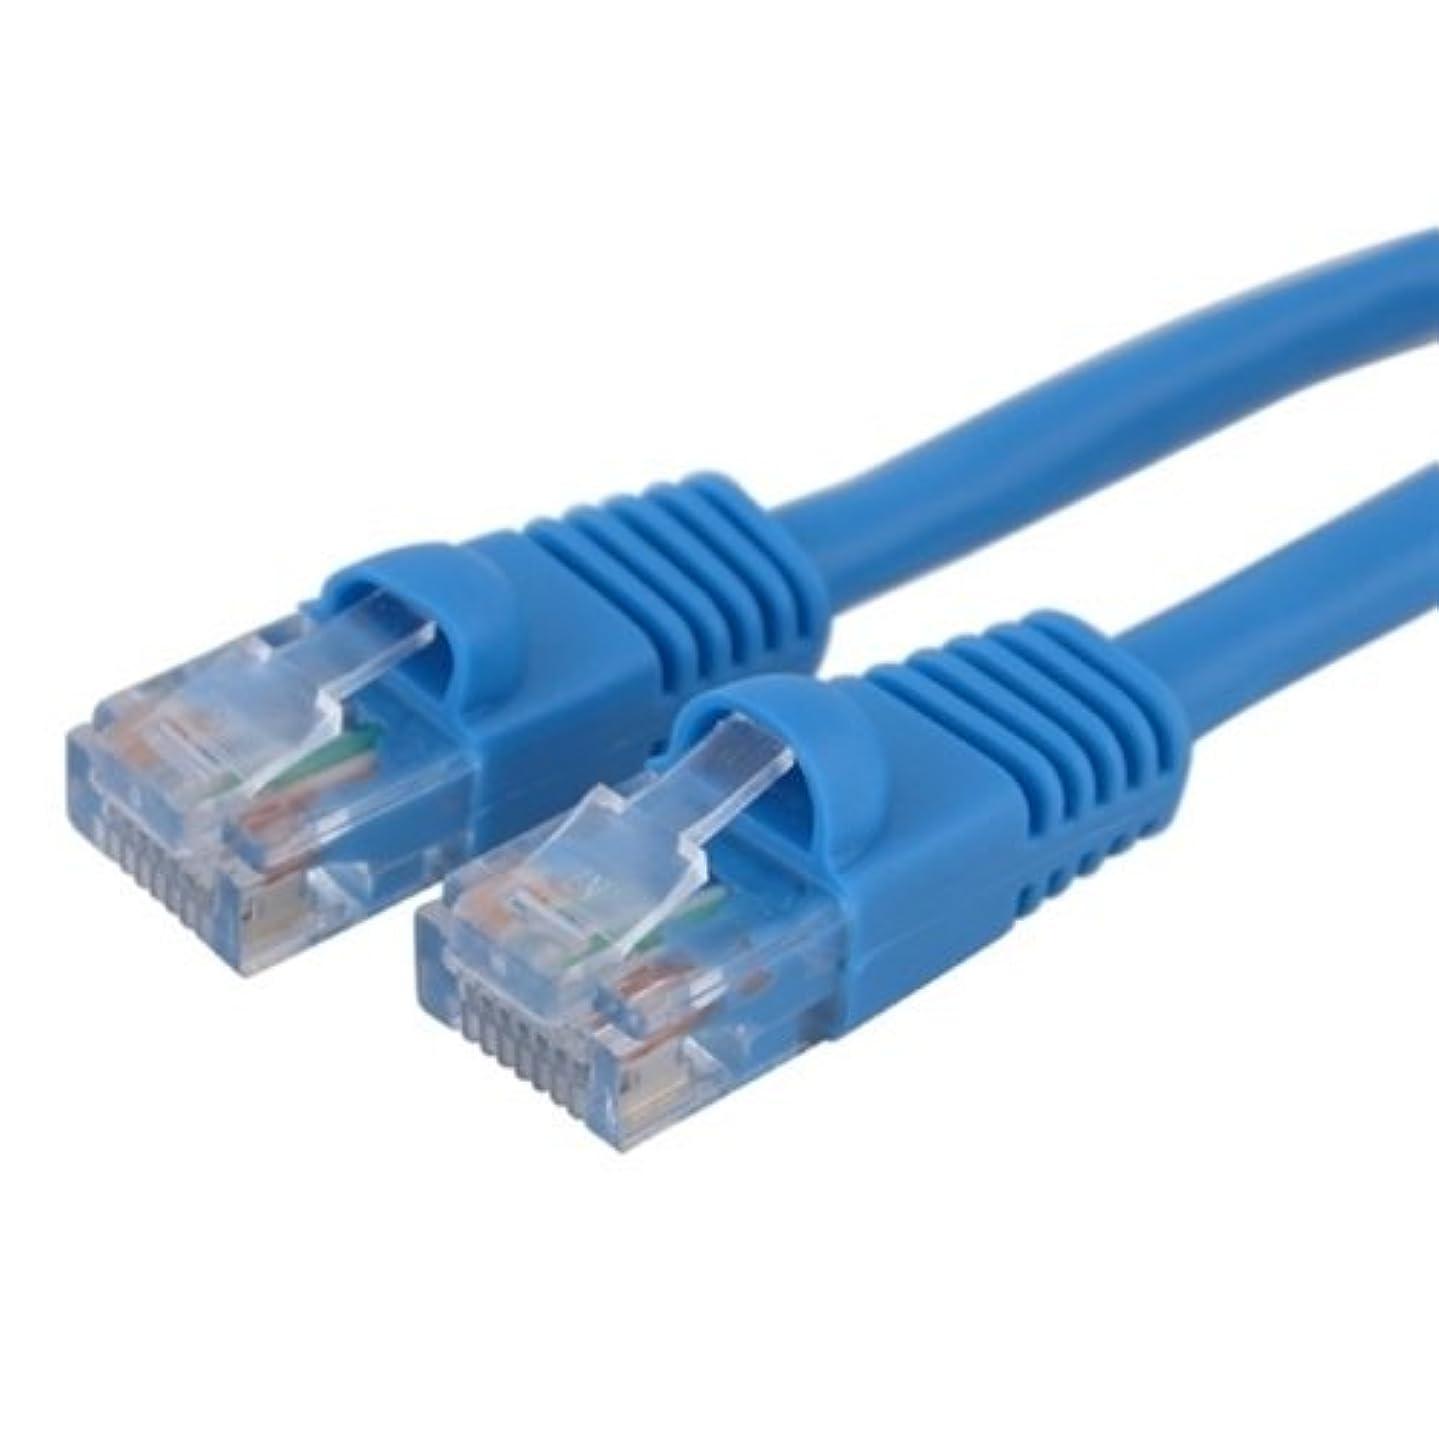 Importer520 Ethernet Cable, CAT5e - 25 ft Blue